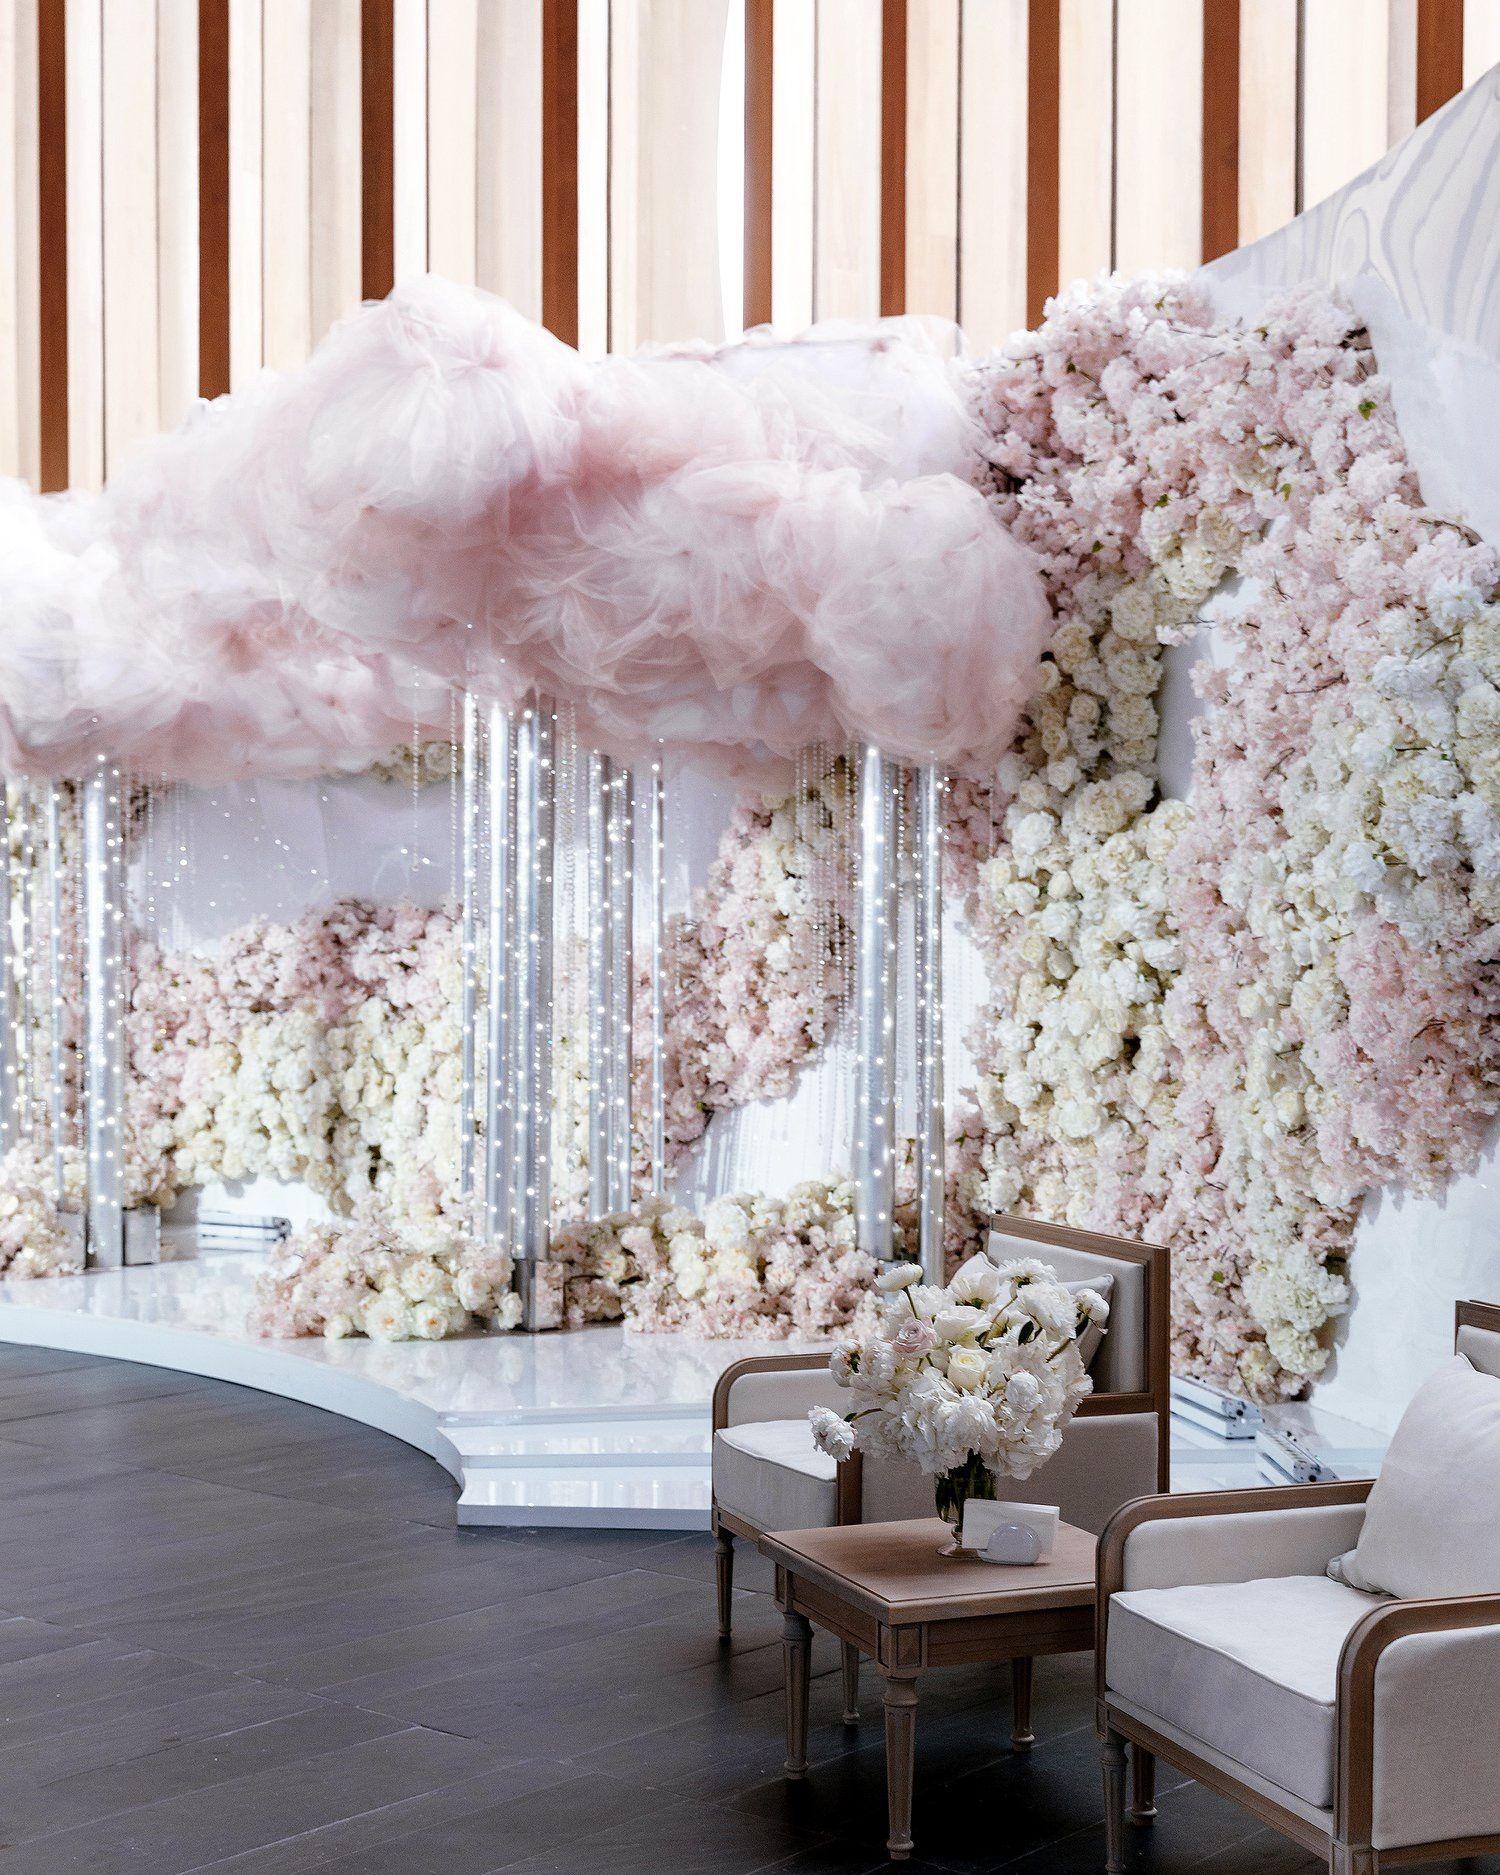 Flowers Wedding Engagement Event Magical Party Decor Ideas